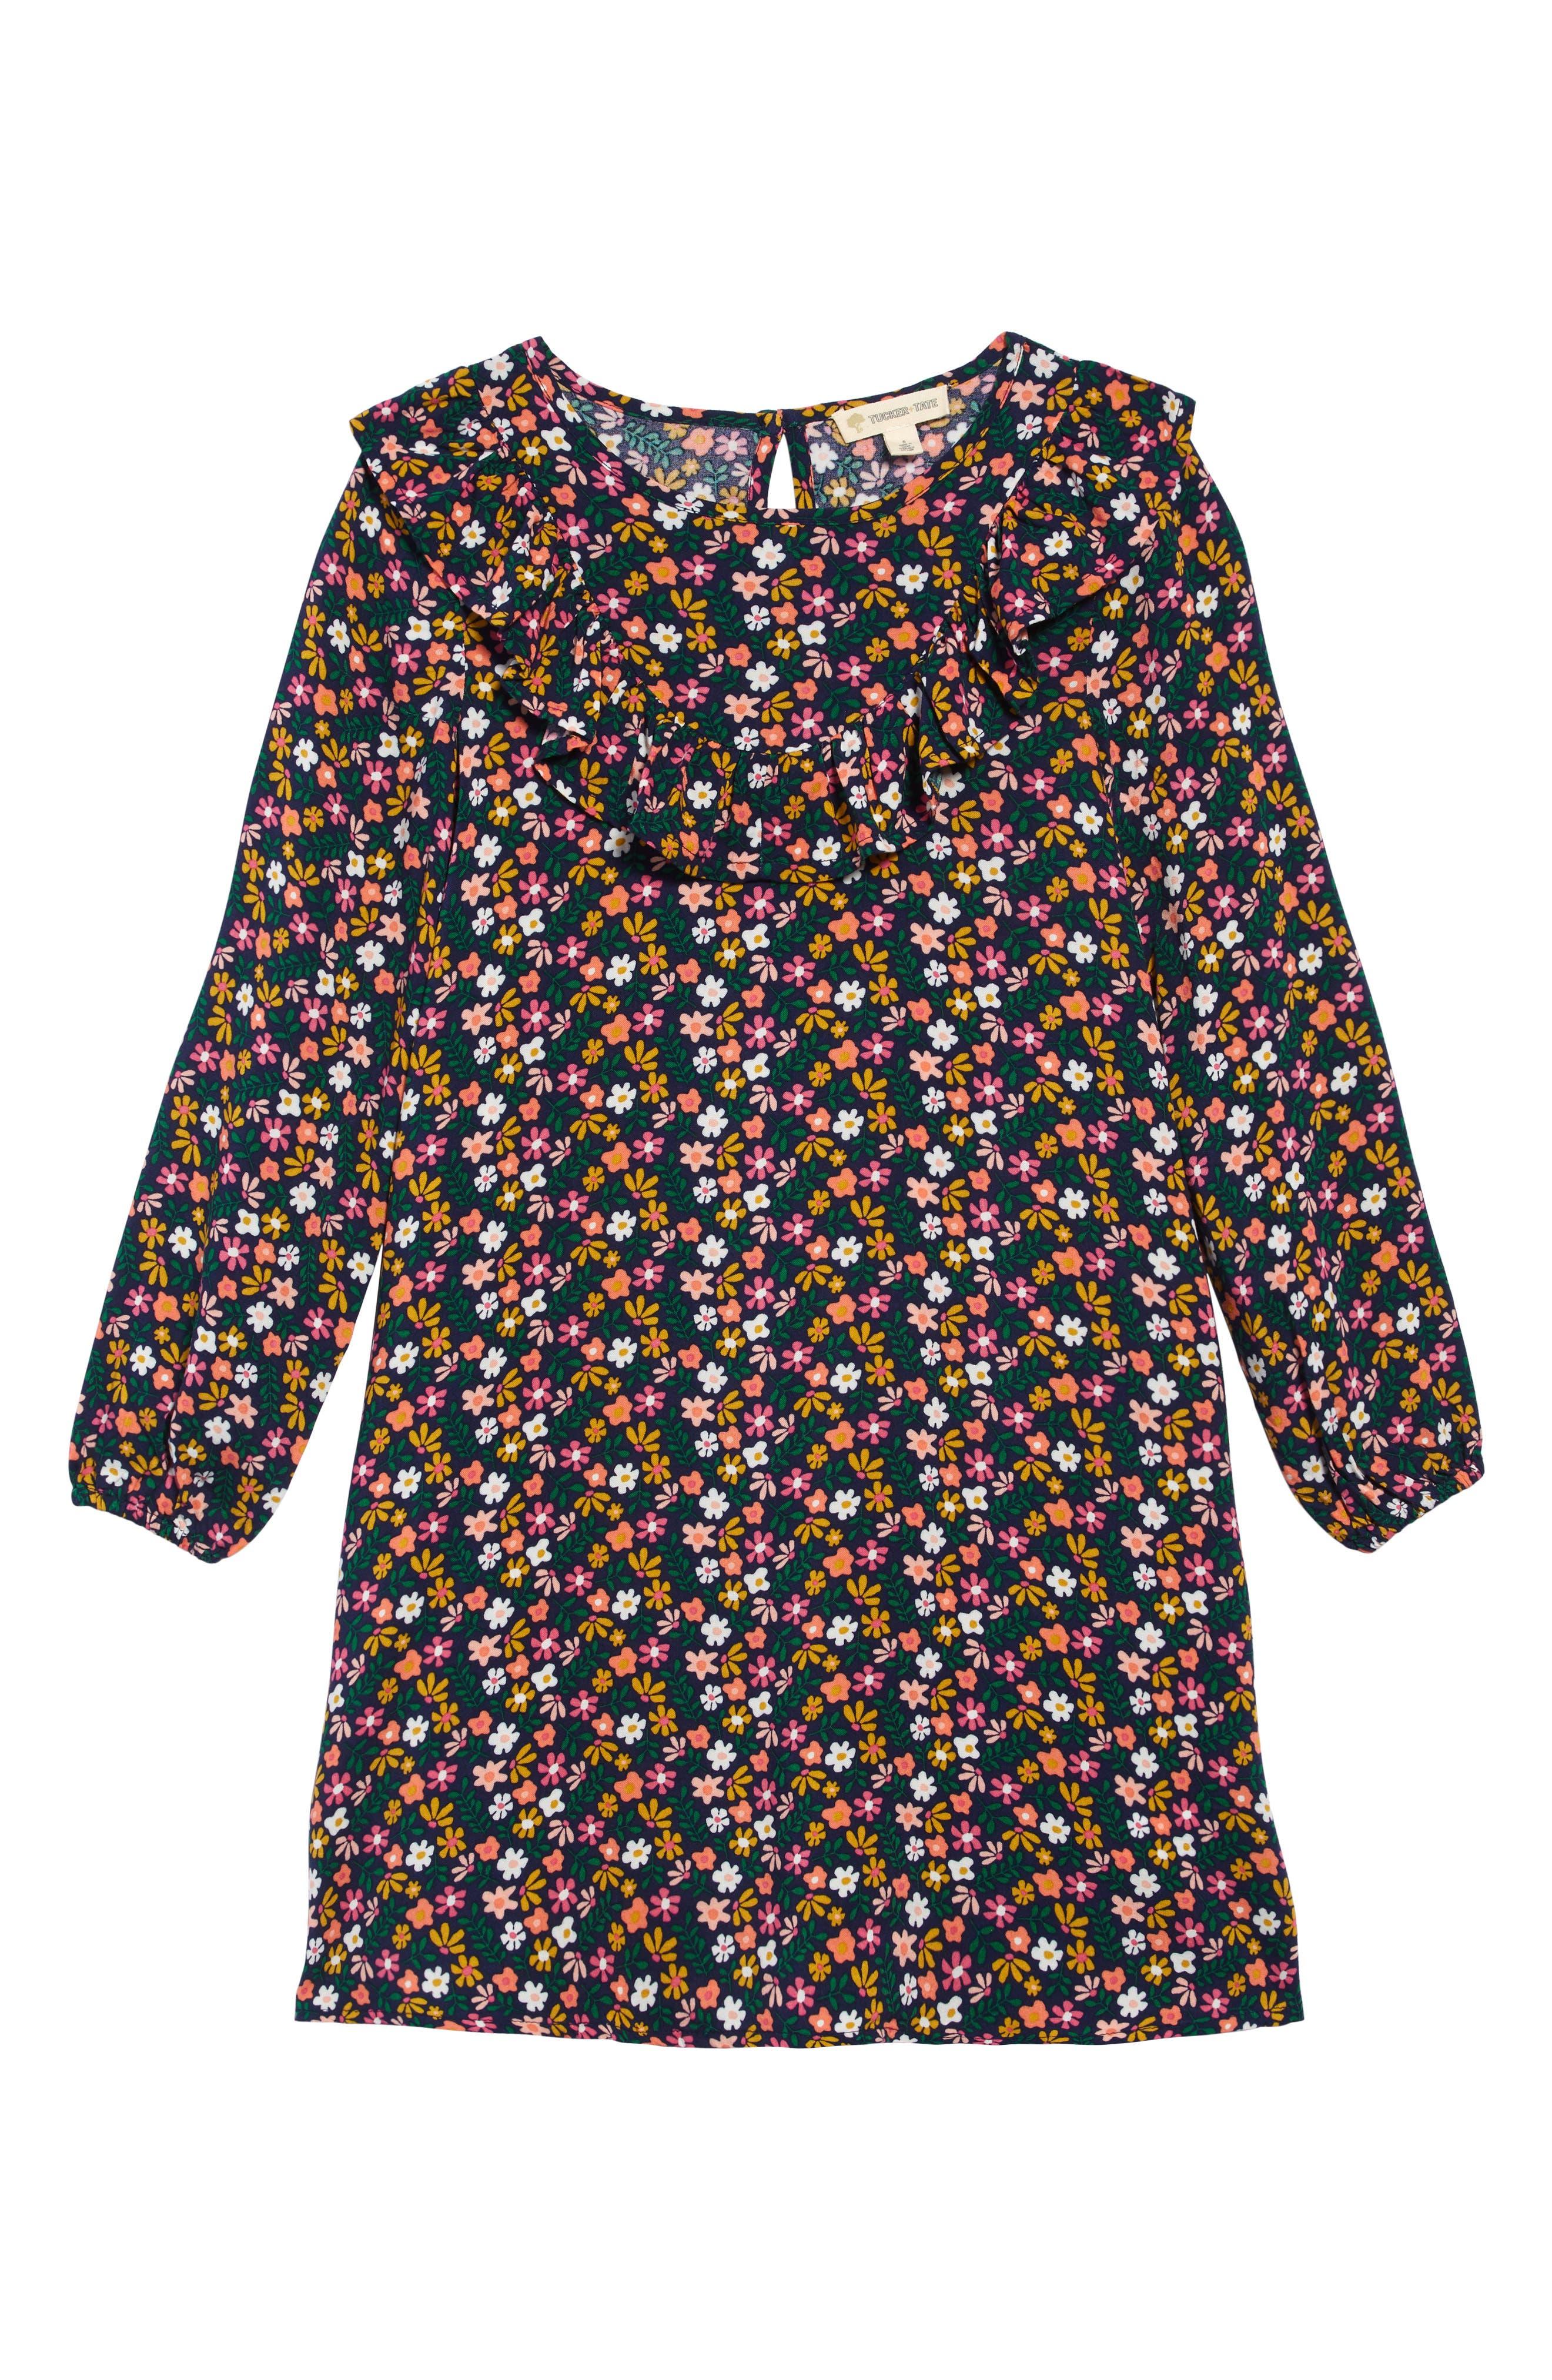 60s 70s Kids Costumes & Clothing Girls & Boys Toddler Girls Tucker  Tate Floral Print Ruffle Dress Size 3T - Blue $35.00 AT vintagedancer.com